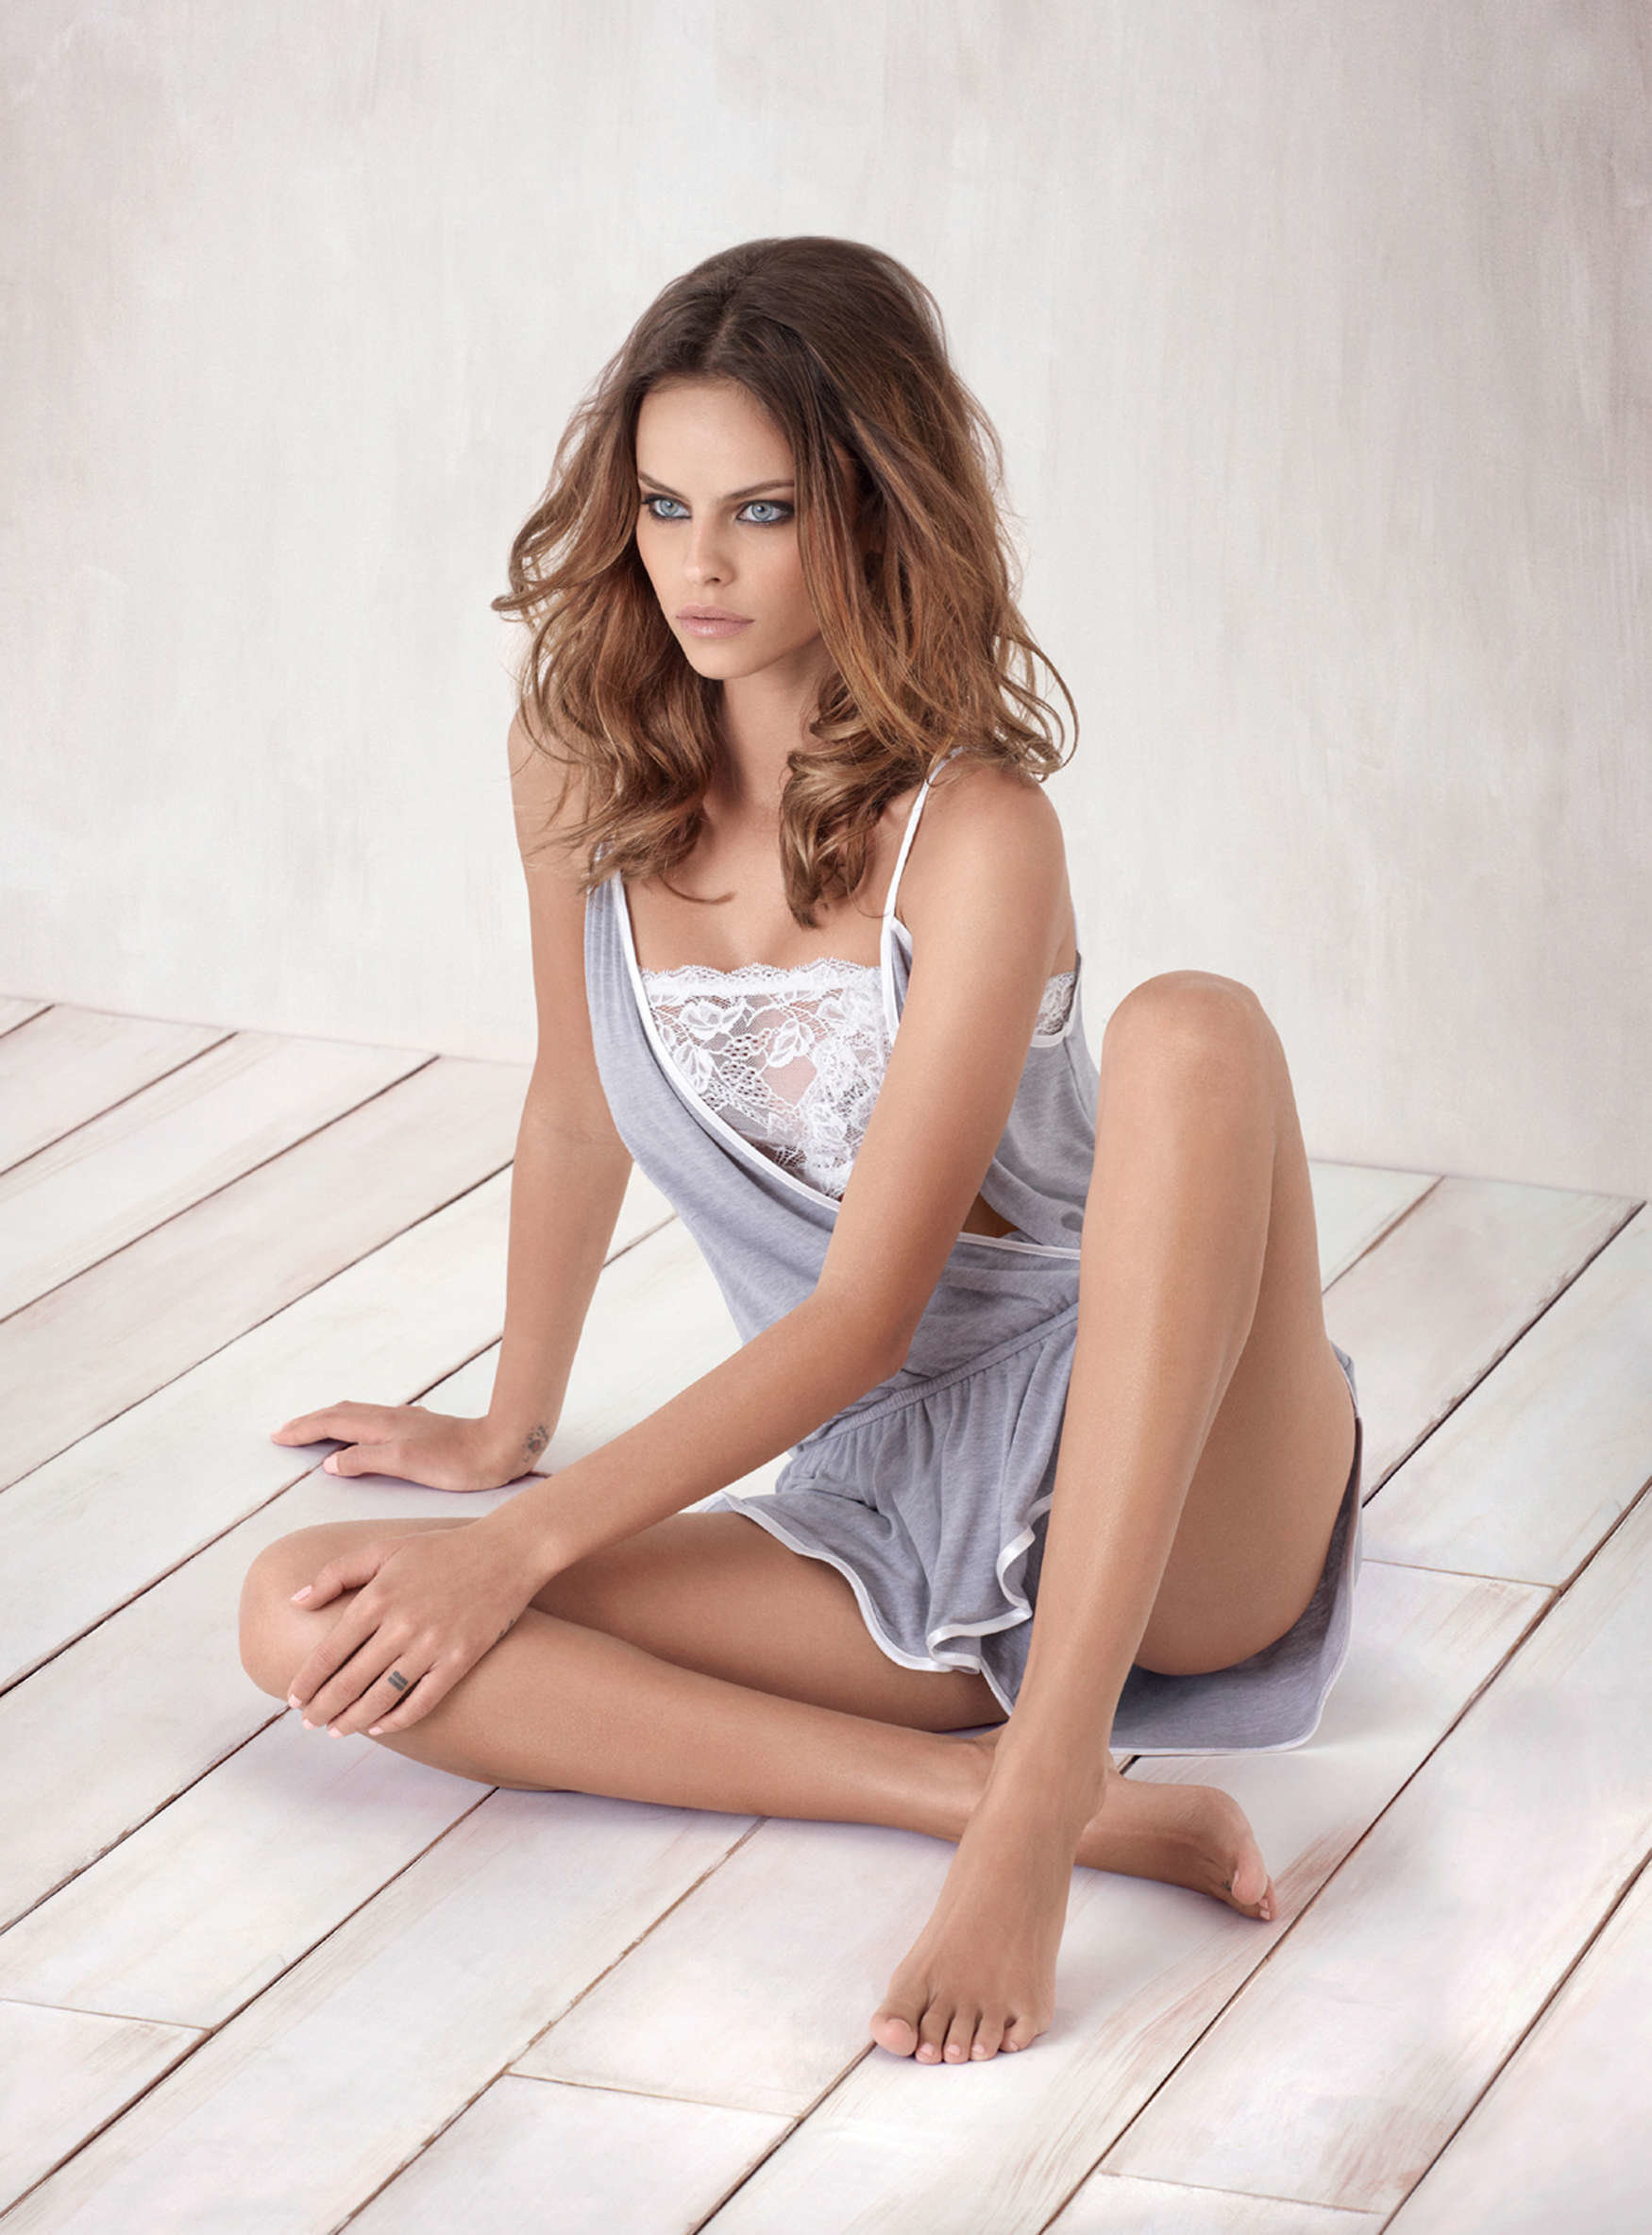 Feet Daniela Freitas nude photos 2019